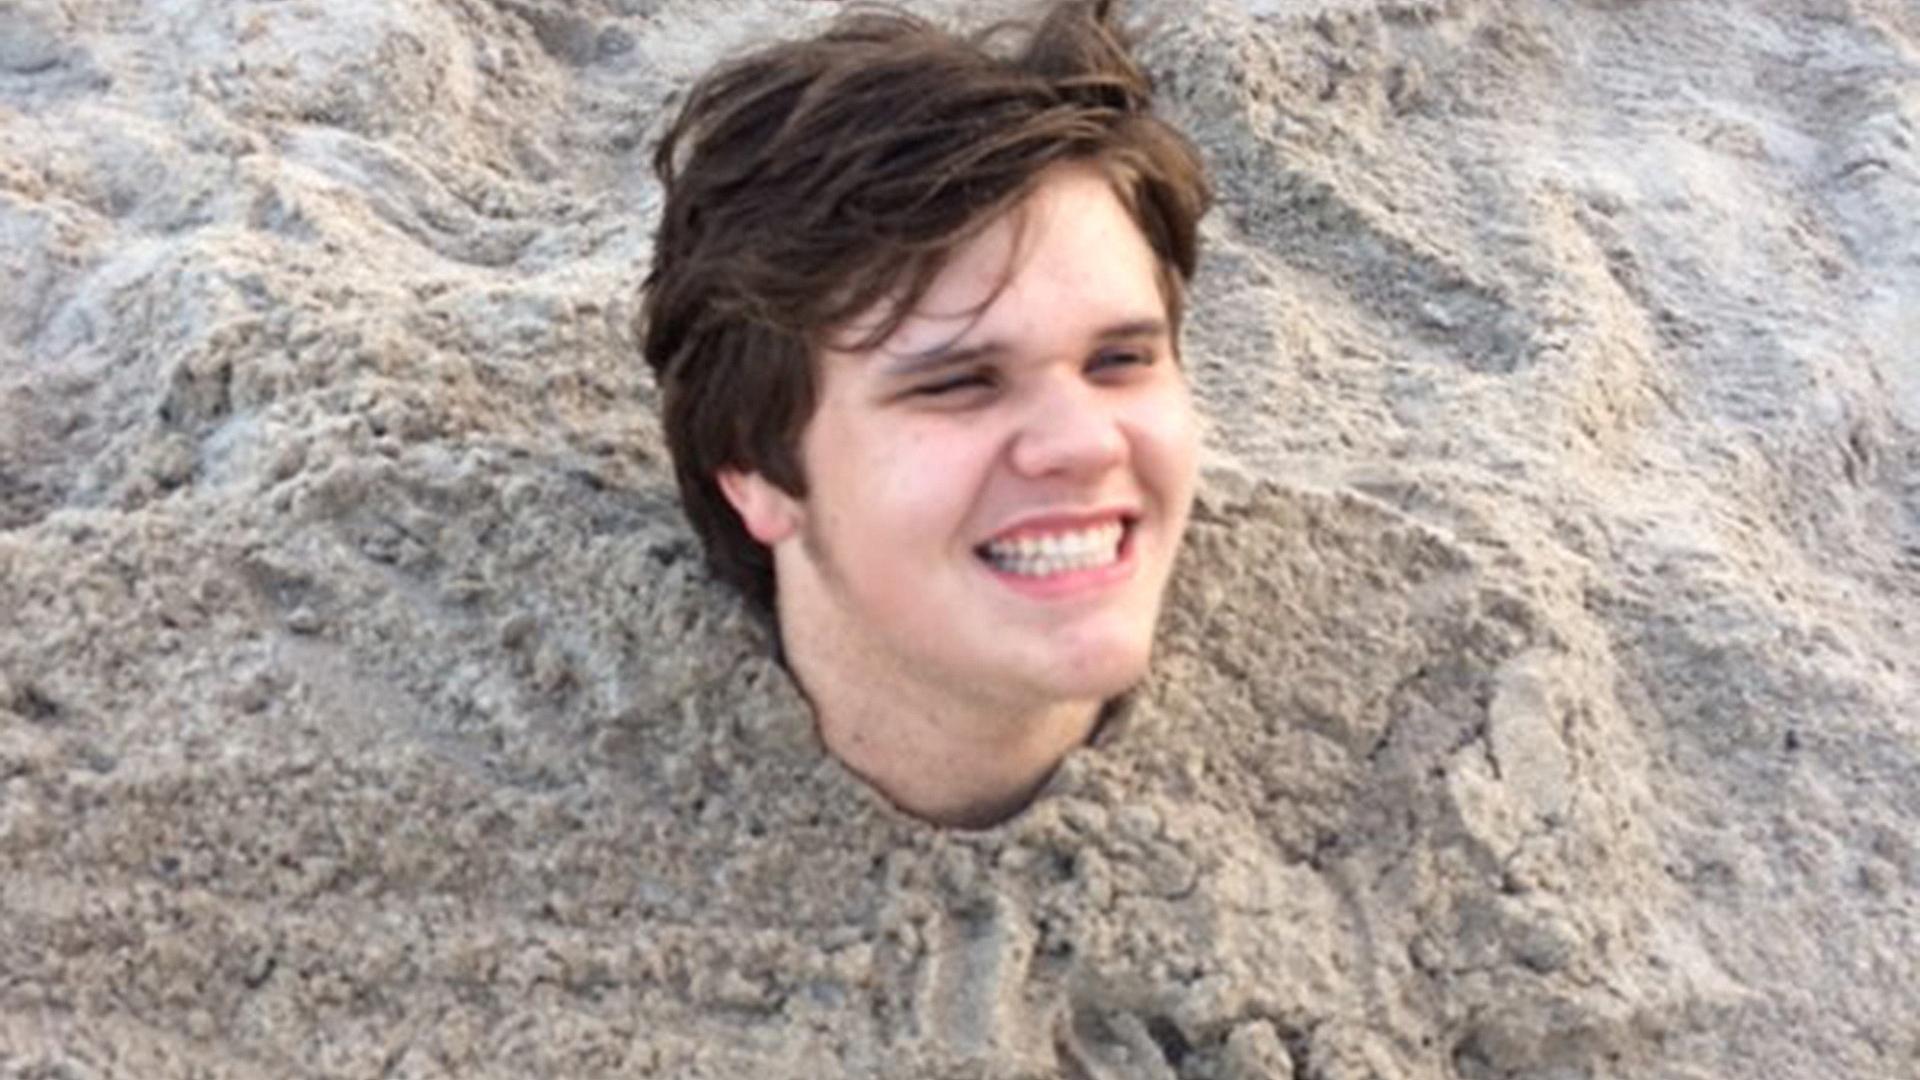 Teen develops hookworm after being buried in sand in Florida